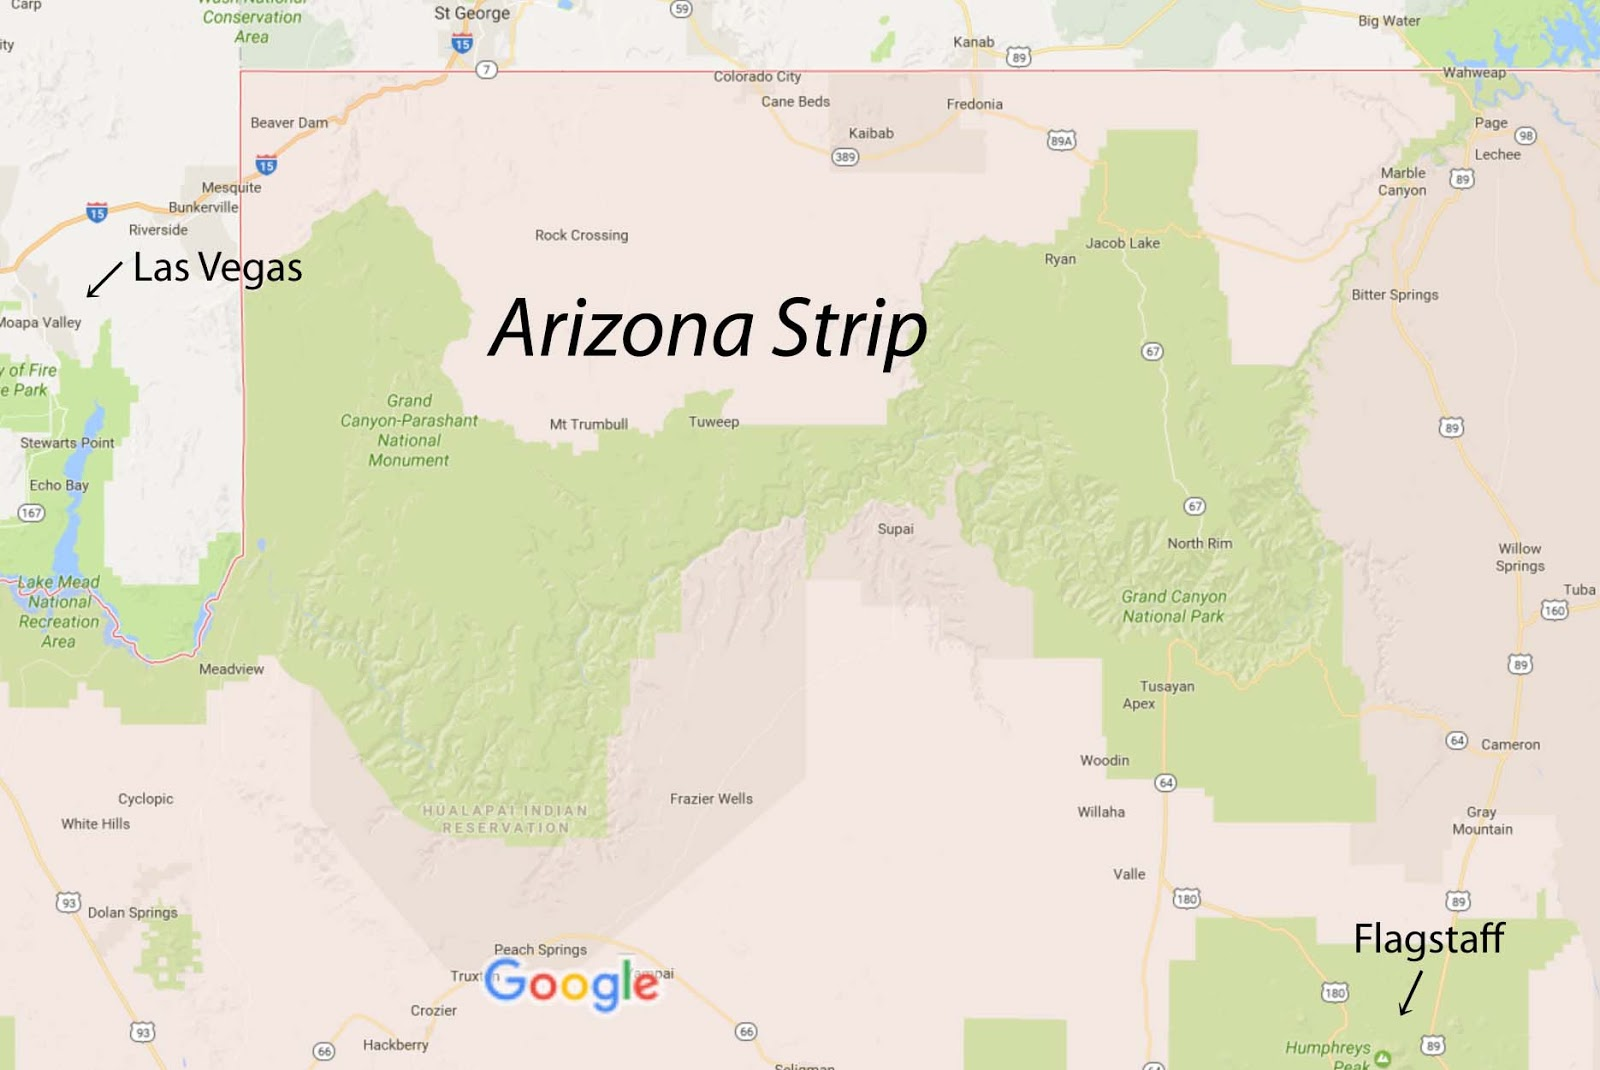 Map Of Just Arizona.Running From Moose The Arizona Strip Toroweap And Nampaweap Rock